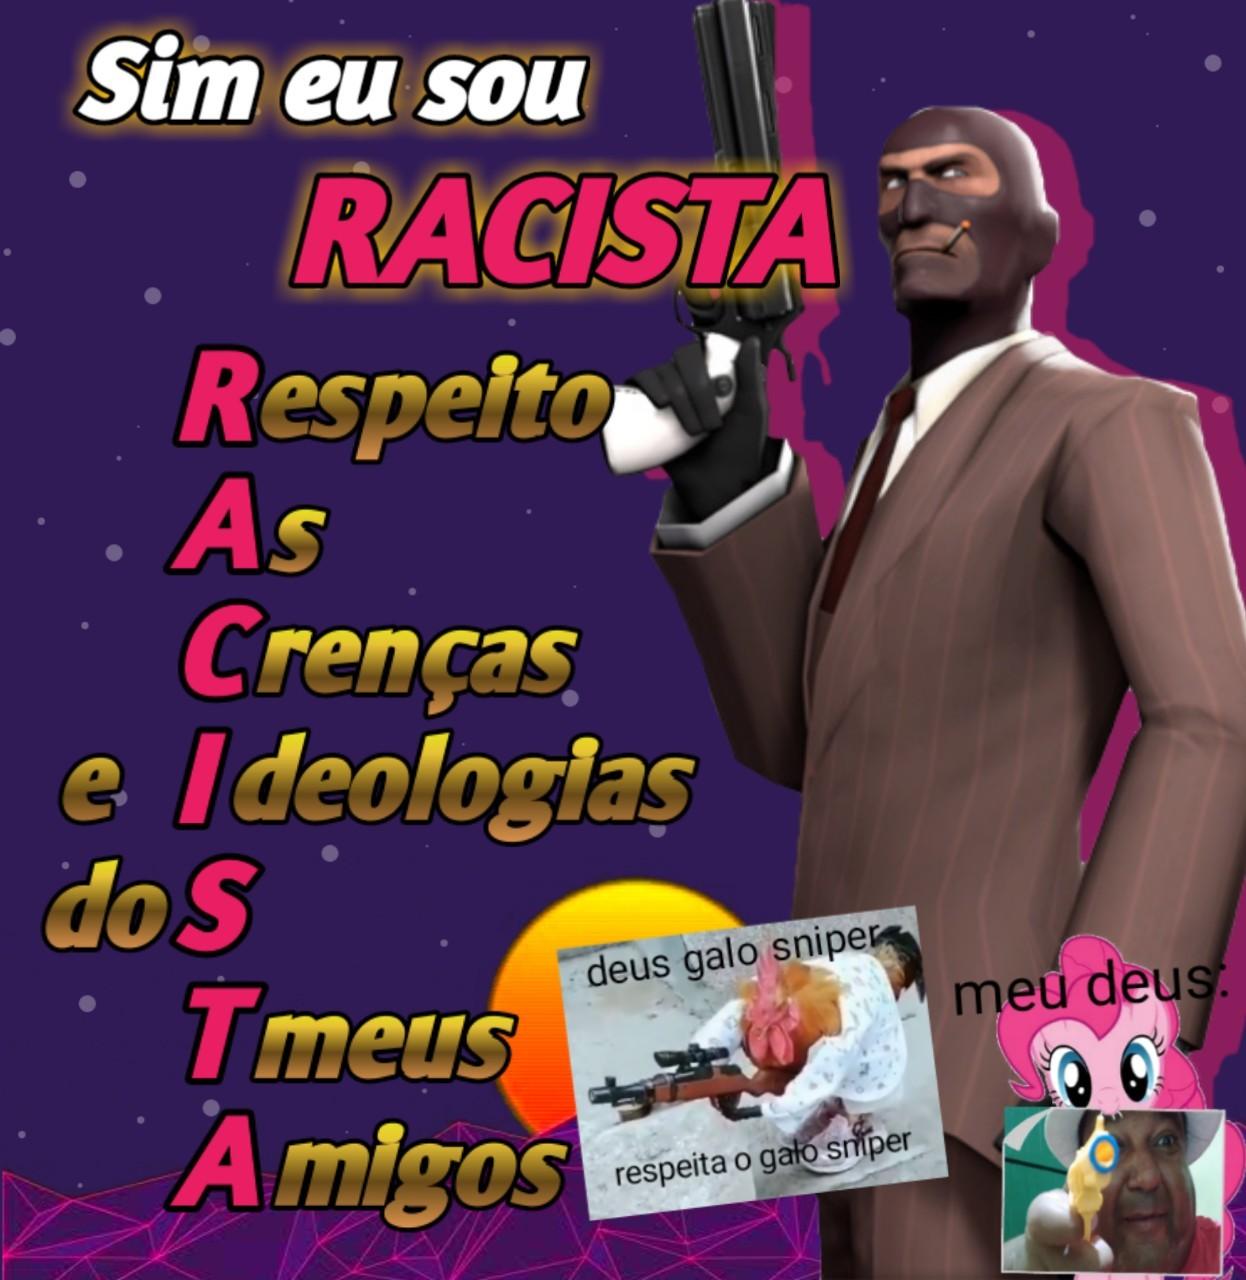 seja racista - meme